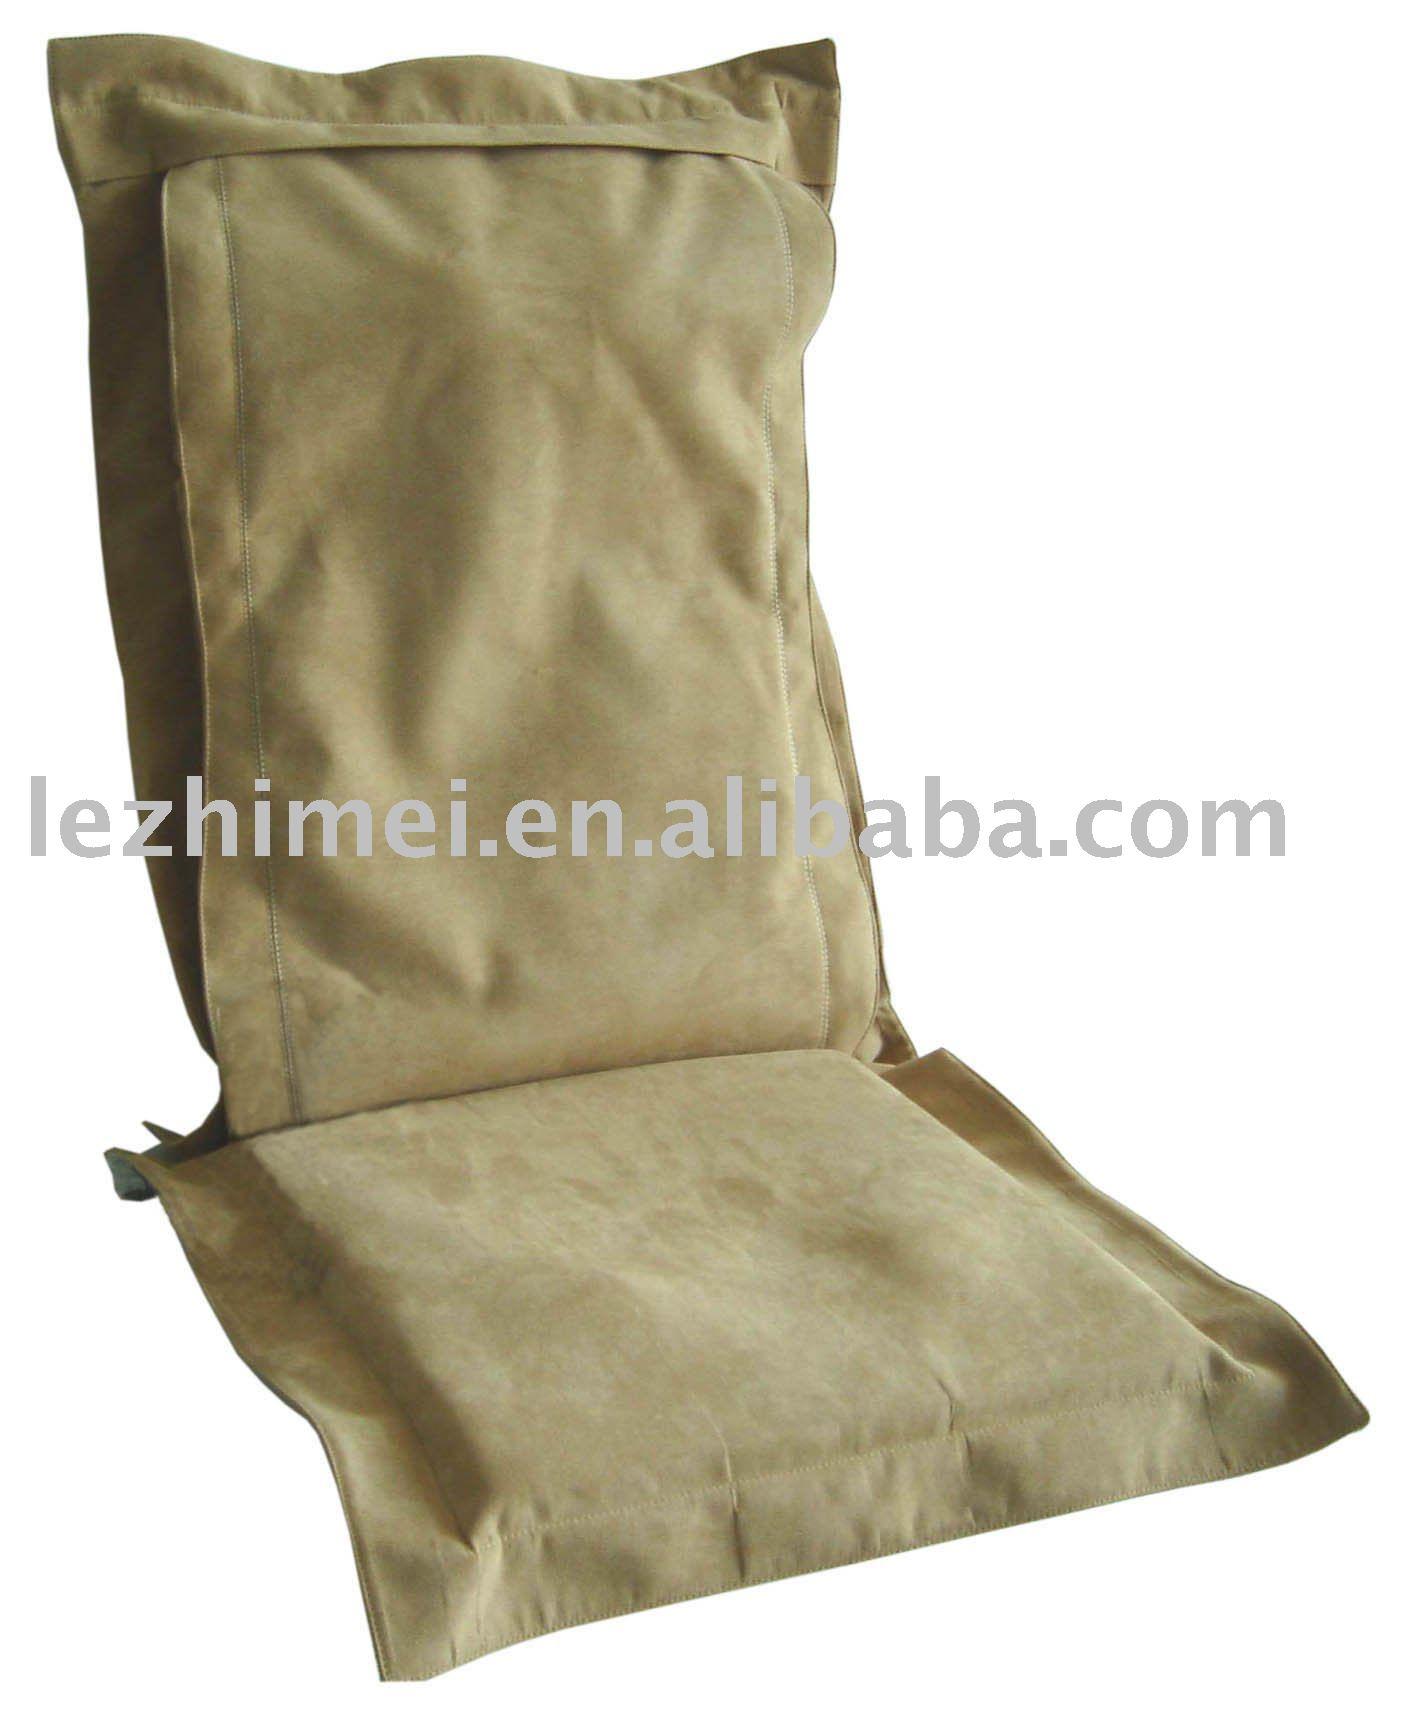 Mechanical Massage Mechanical Massage Suppliers and Manufacturers